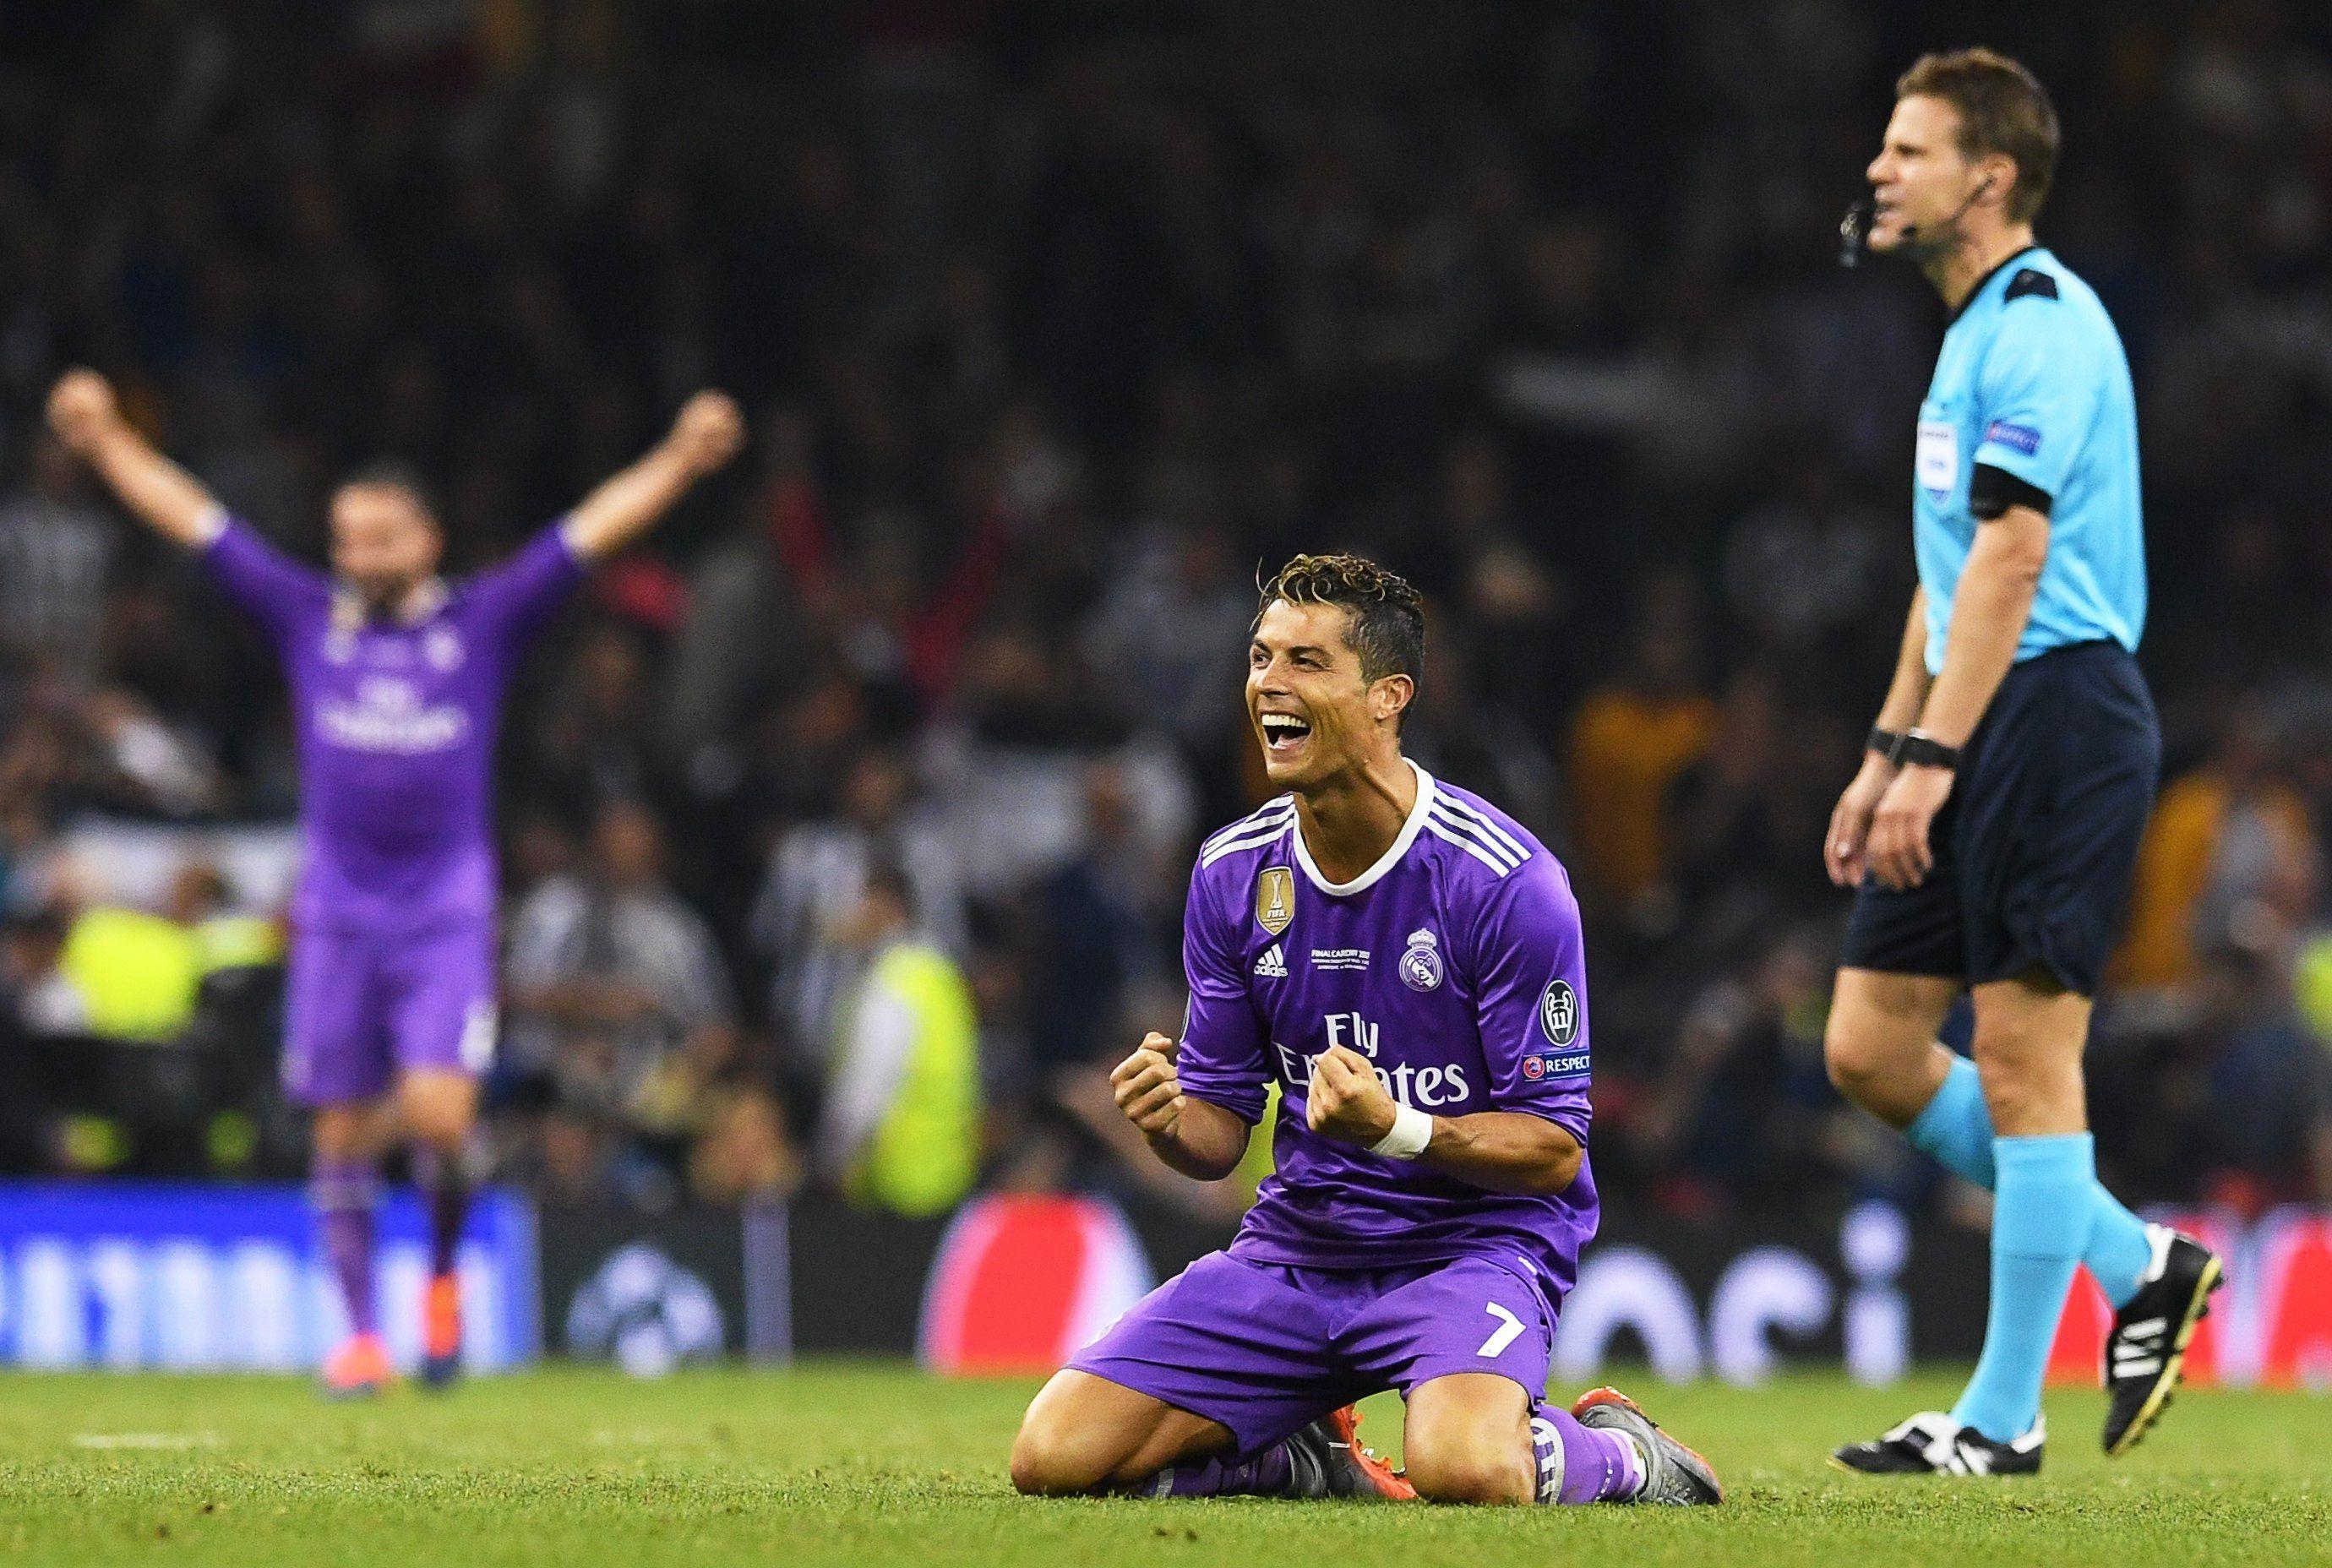 Real Madrid le ganó la Champions a la Juventus con un Ronaldo imparable